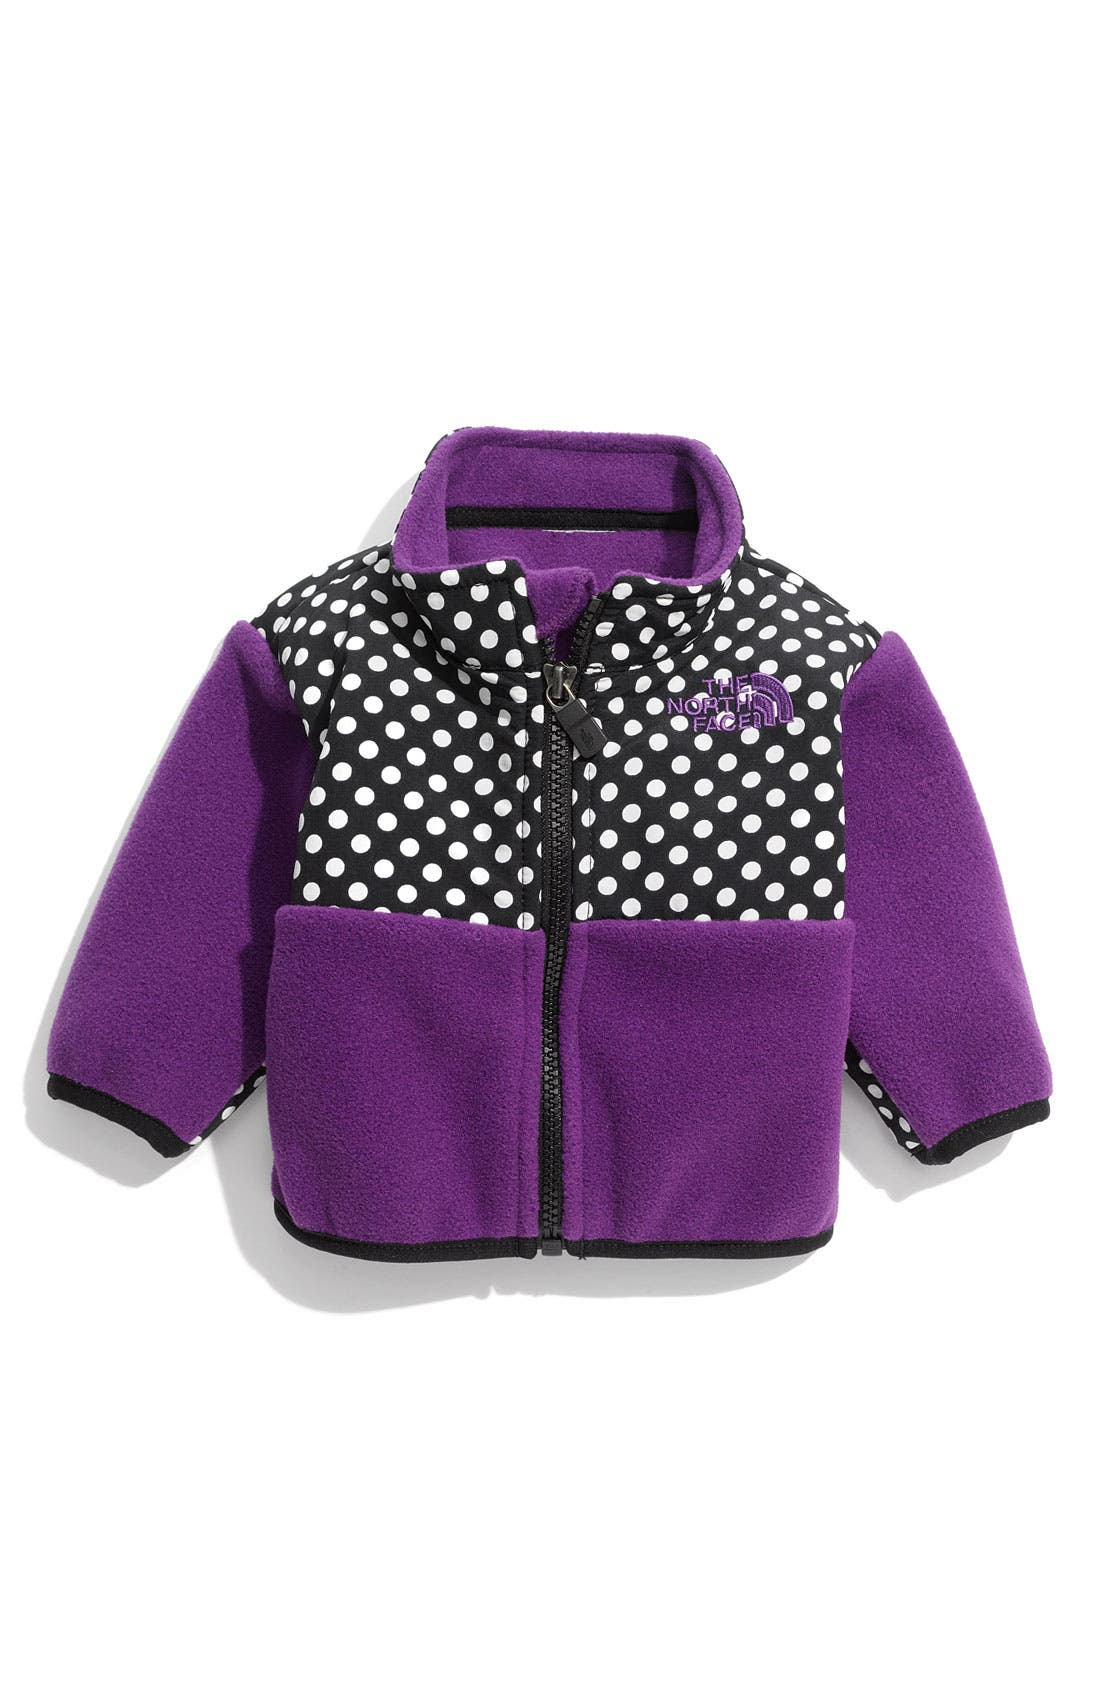 Alternate Image 1 Selected - The North Face 'Denali' Fleece Jacket (Infant)